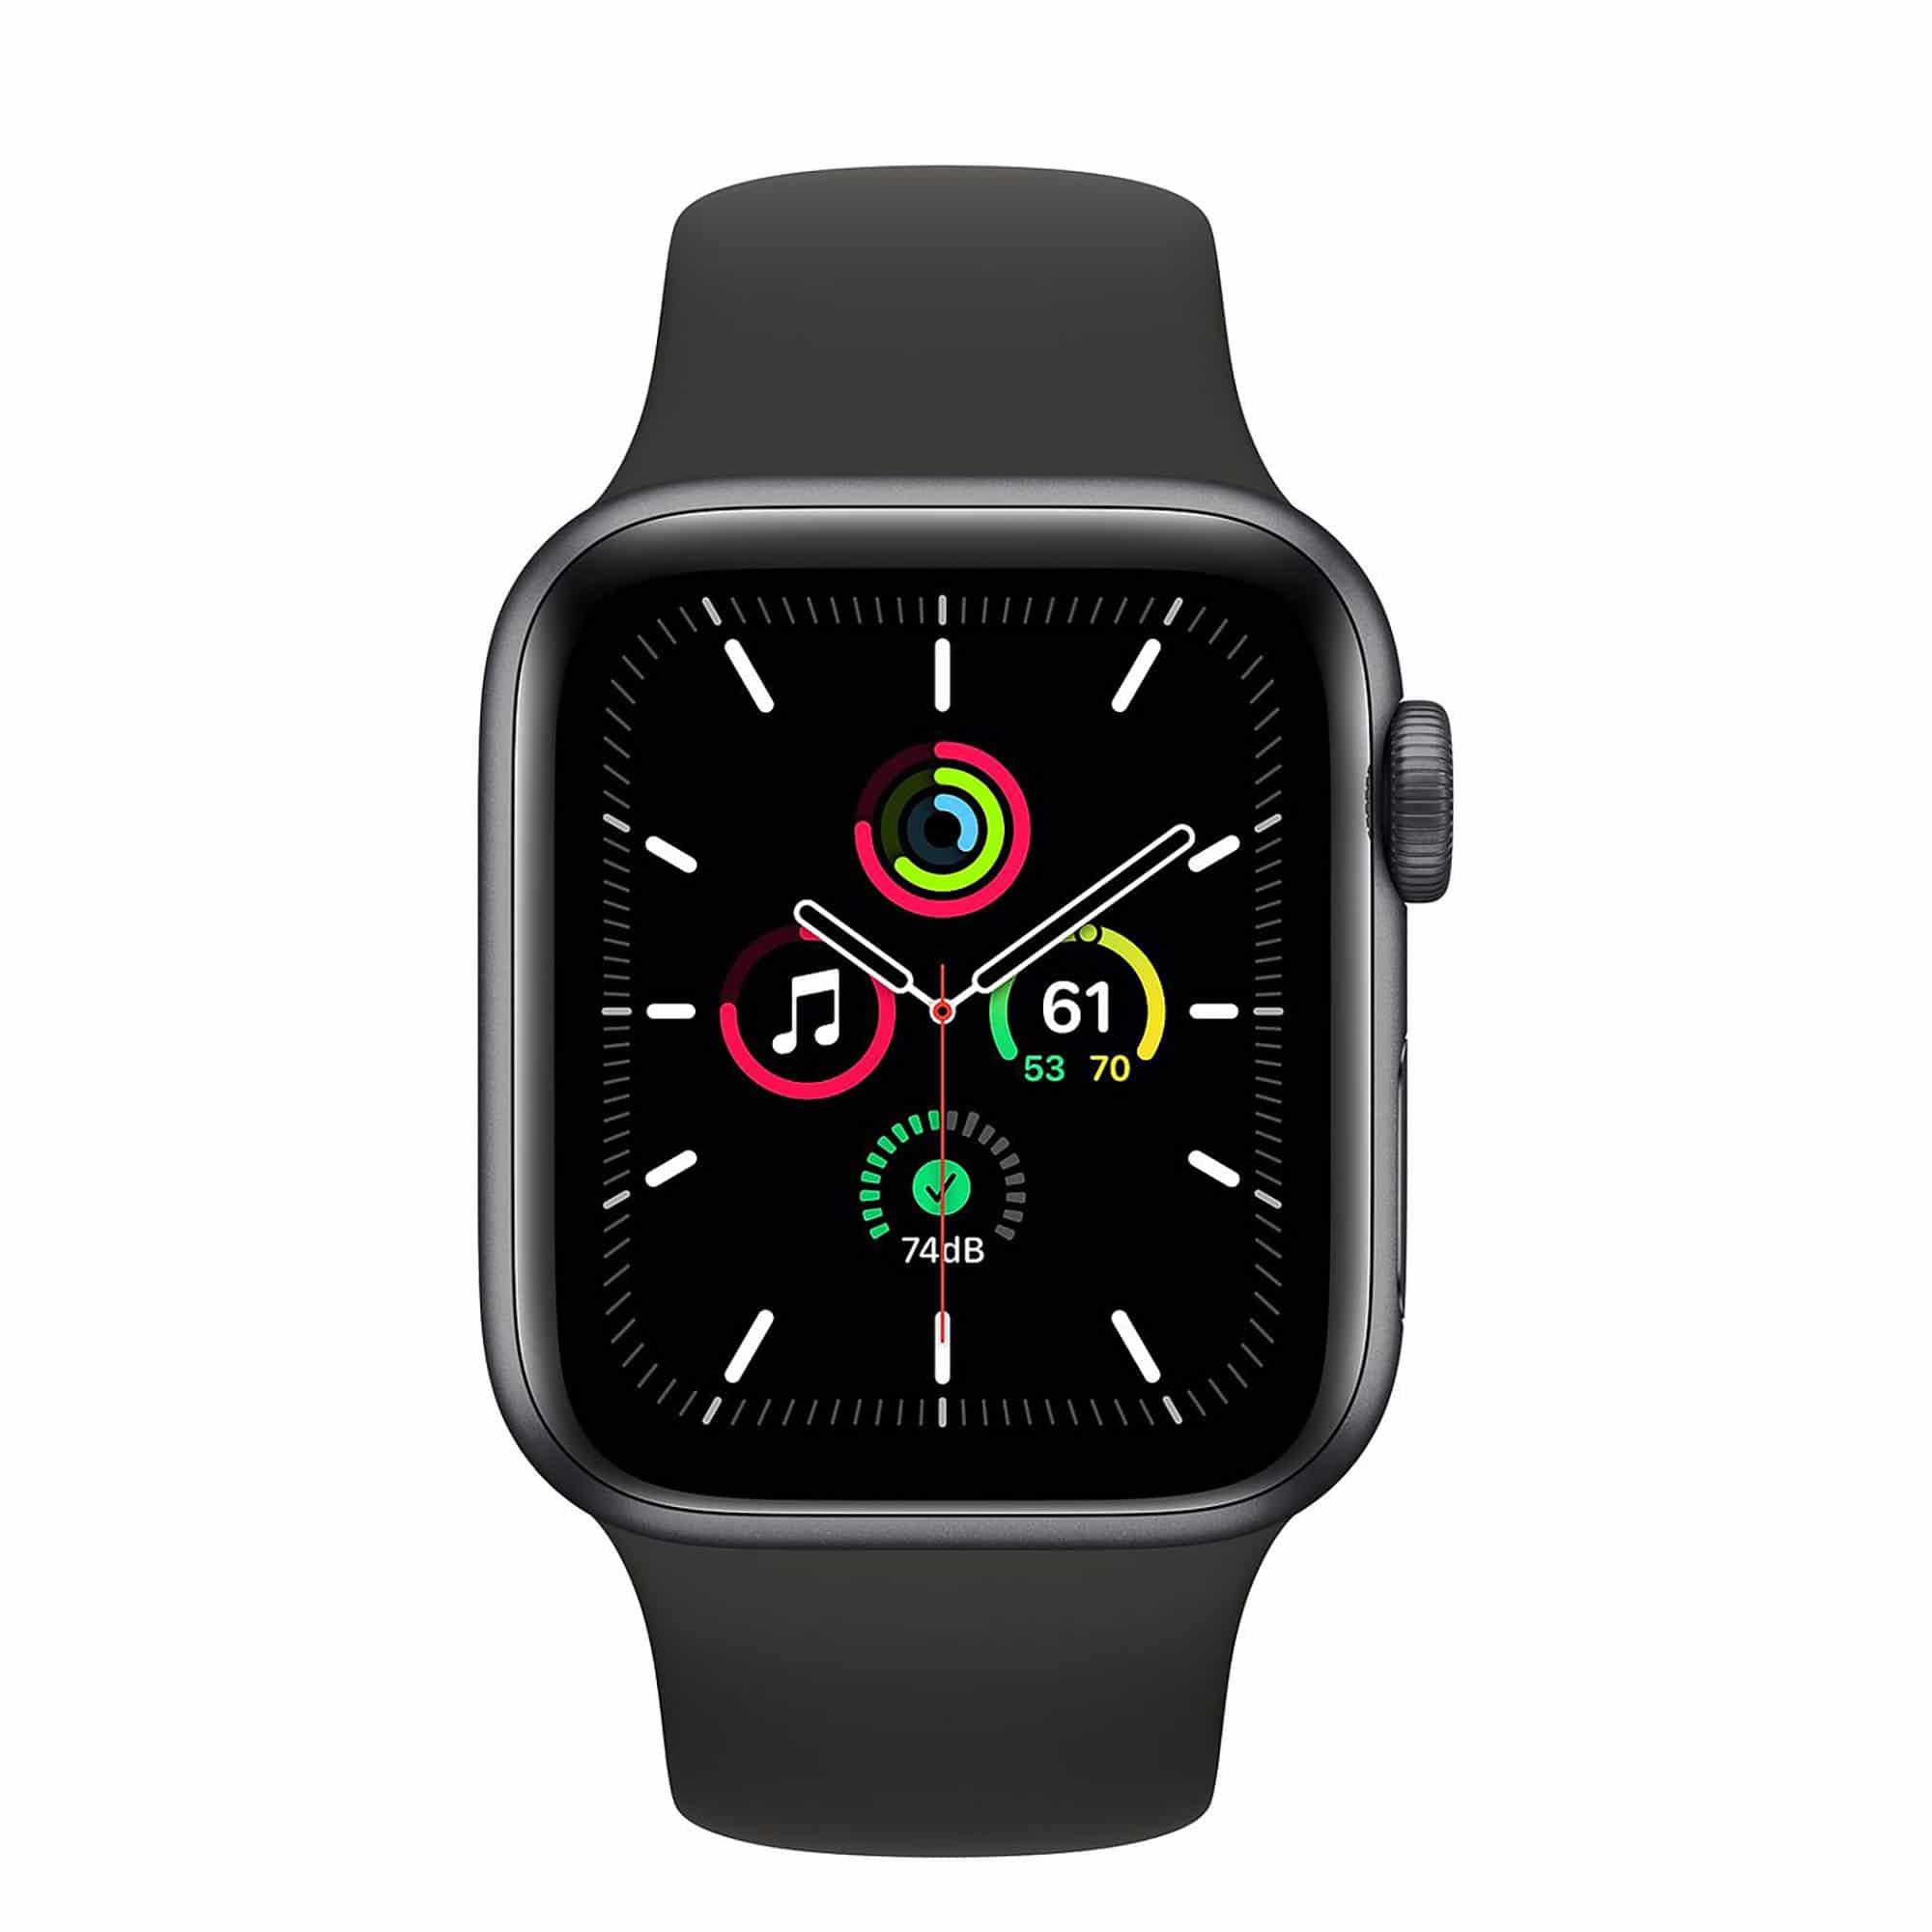 thumbnail 7 - Apple-Watch-SE-GPS-Cellular-40mm-Aluminum-Case-Grade-A